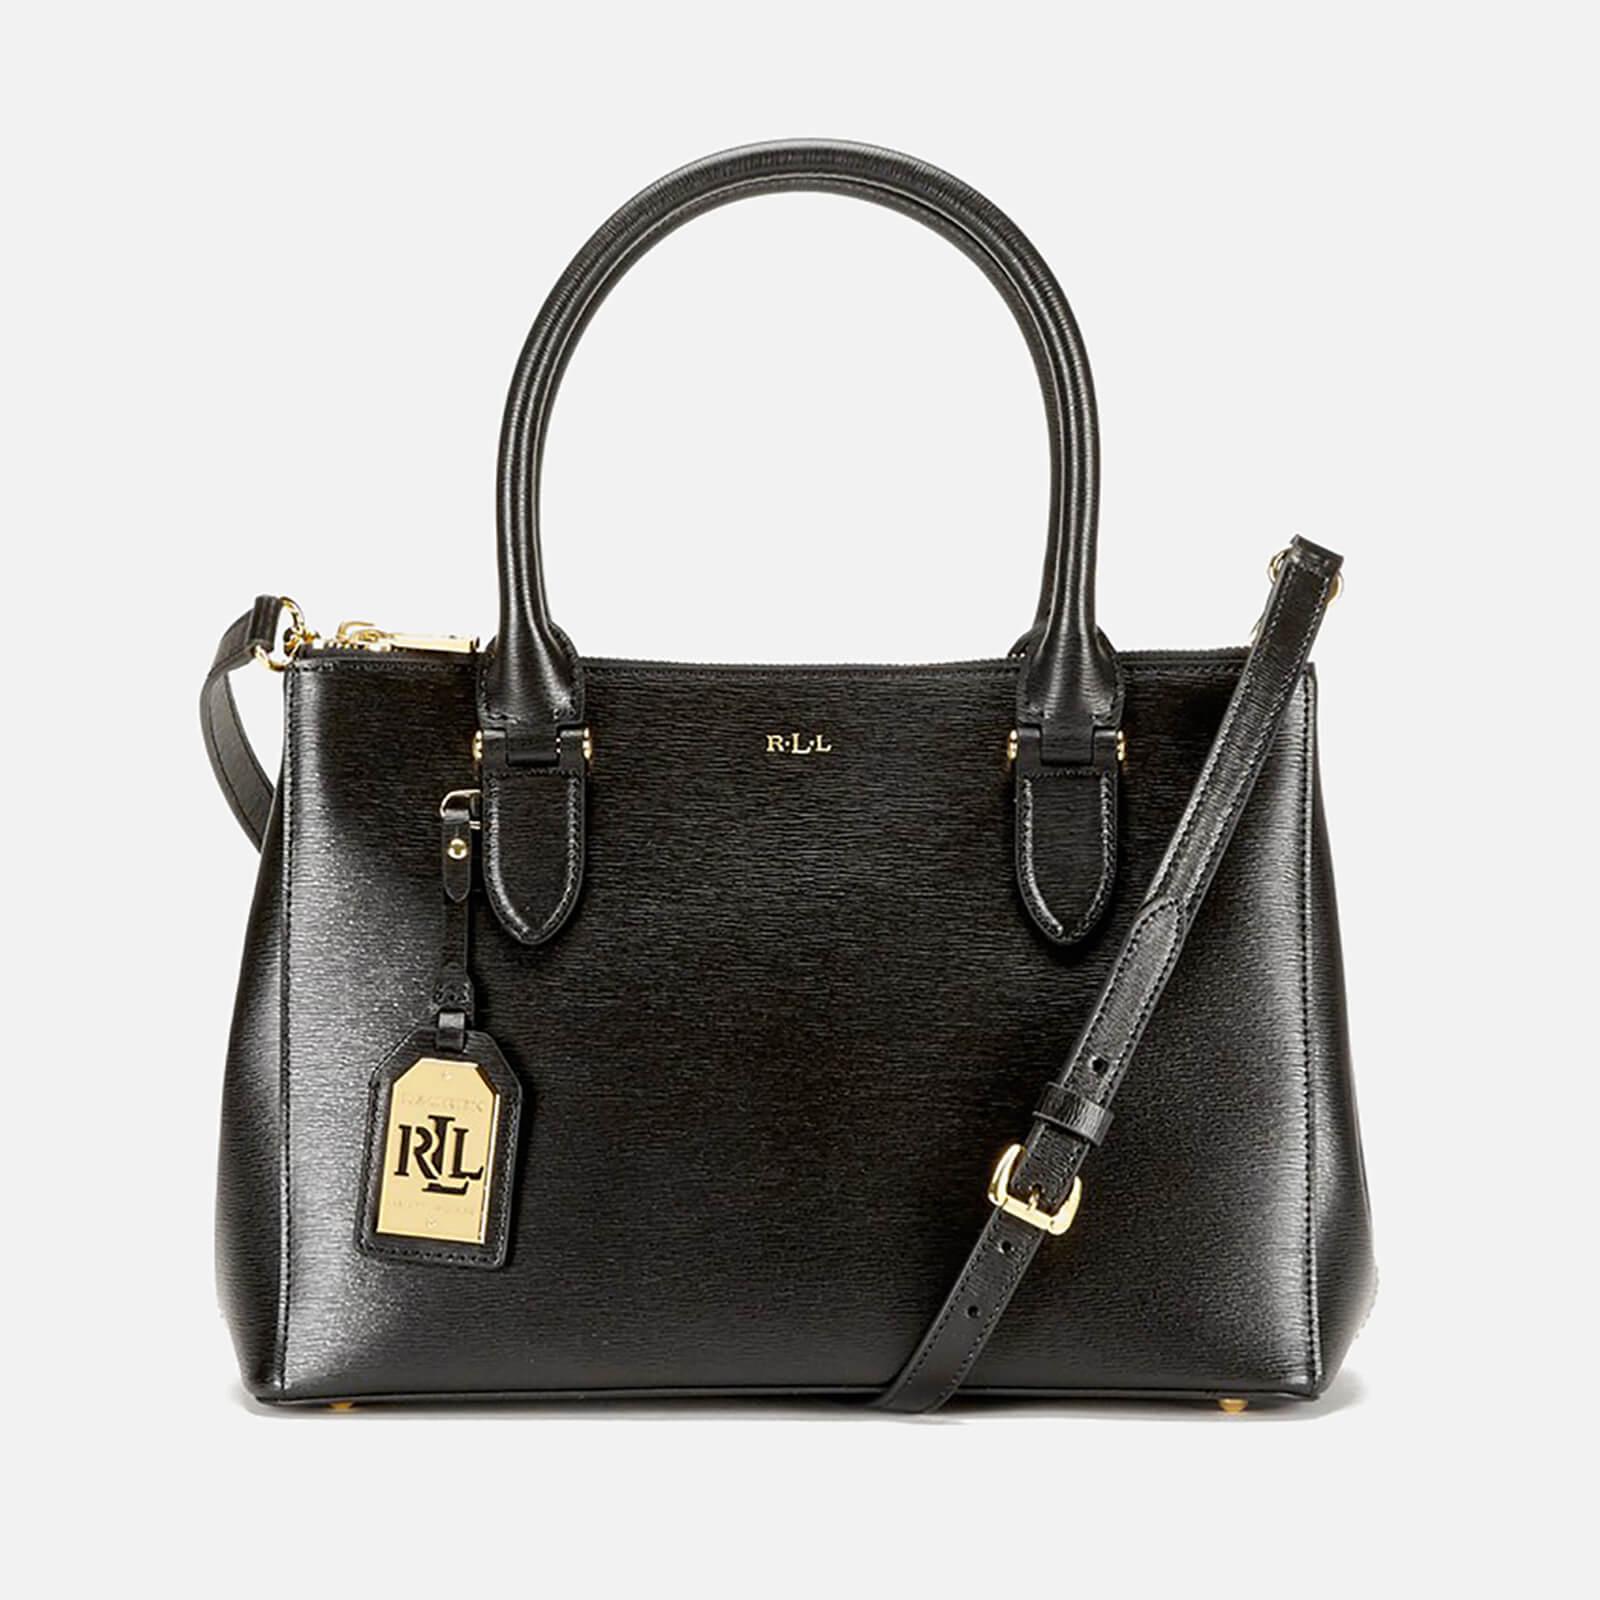 Aika siistiä tulokas Aika siistiä Lauren Ralph Lauren Women's Newbury Double Zipper Shopper Bag - Black